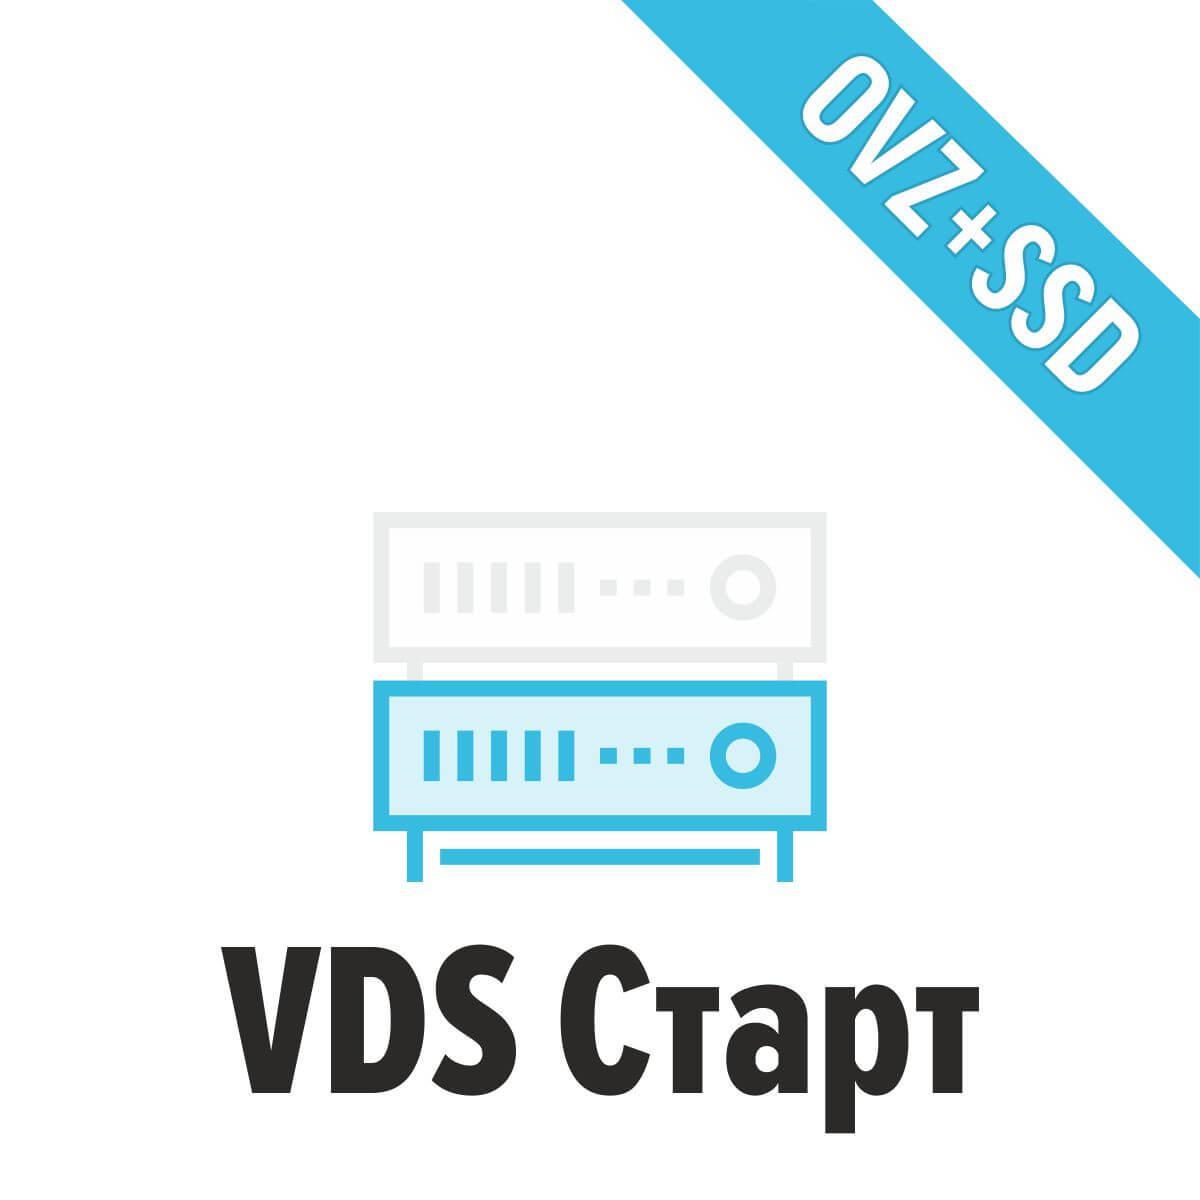 VDS Старт (OpenVZ, SSD, 1 Core, 1Gb RAM, 20Gb SSD)